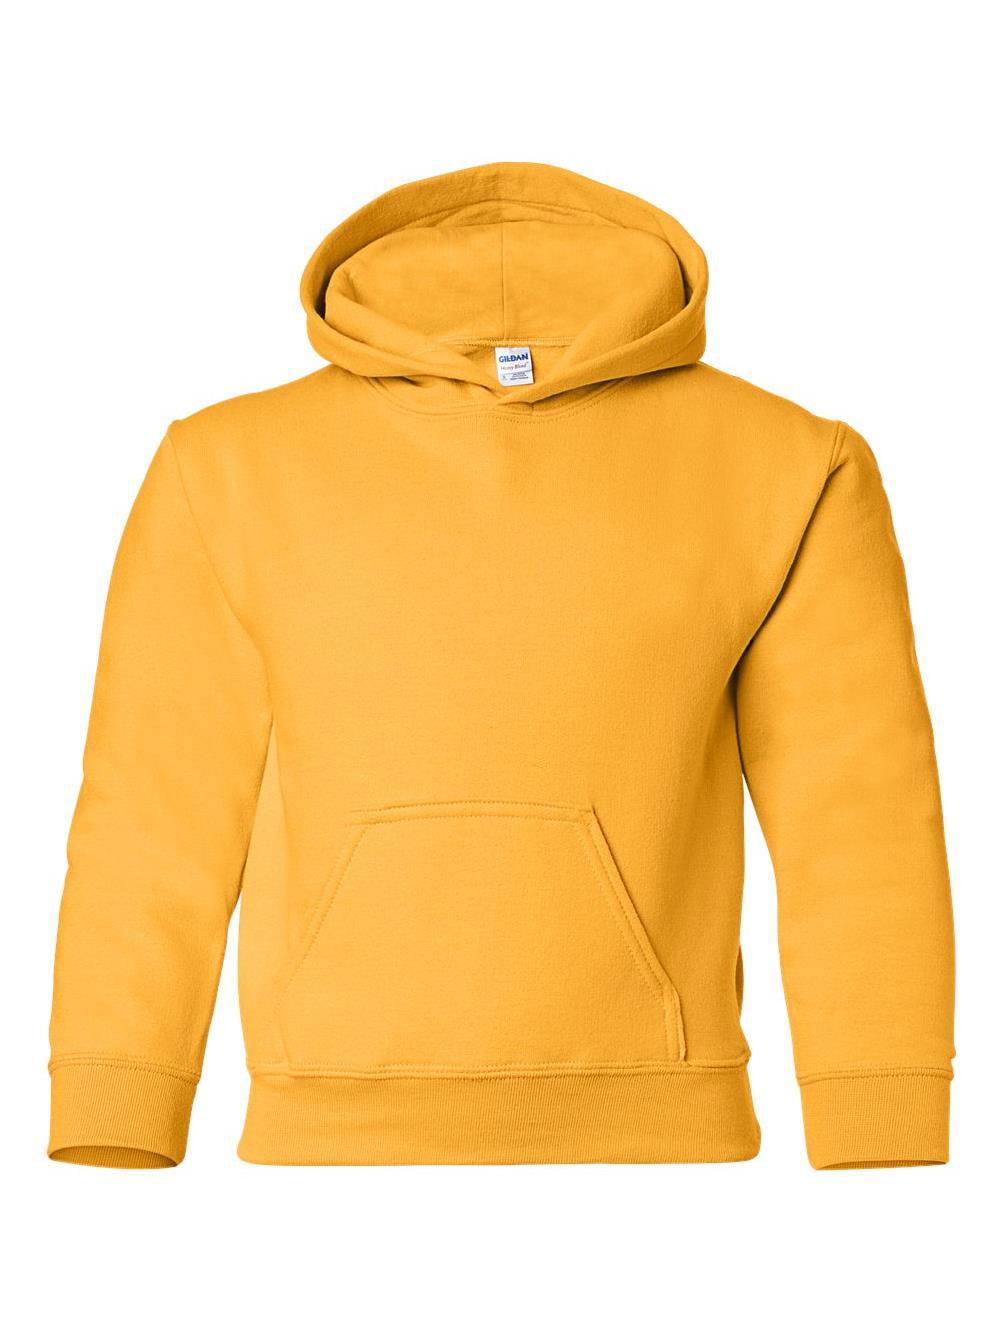 Gildan Fleece Heavy Blend Youth Hooded Sweatshirt 18500B